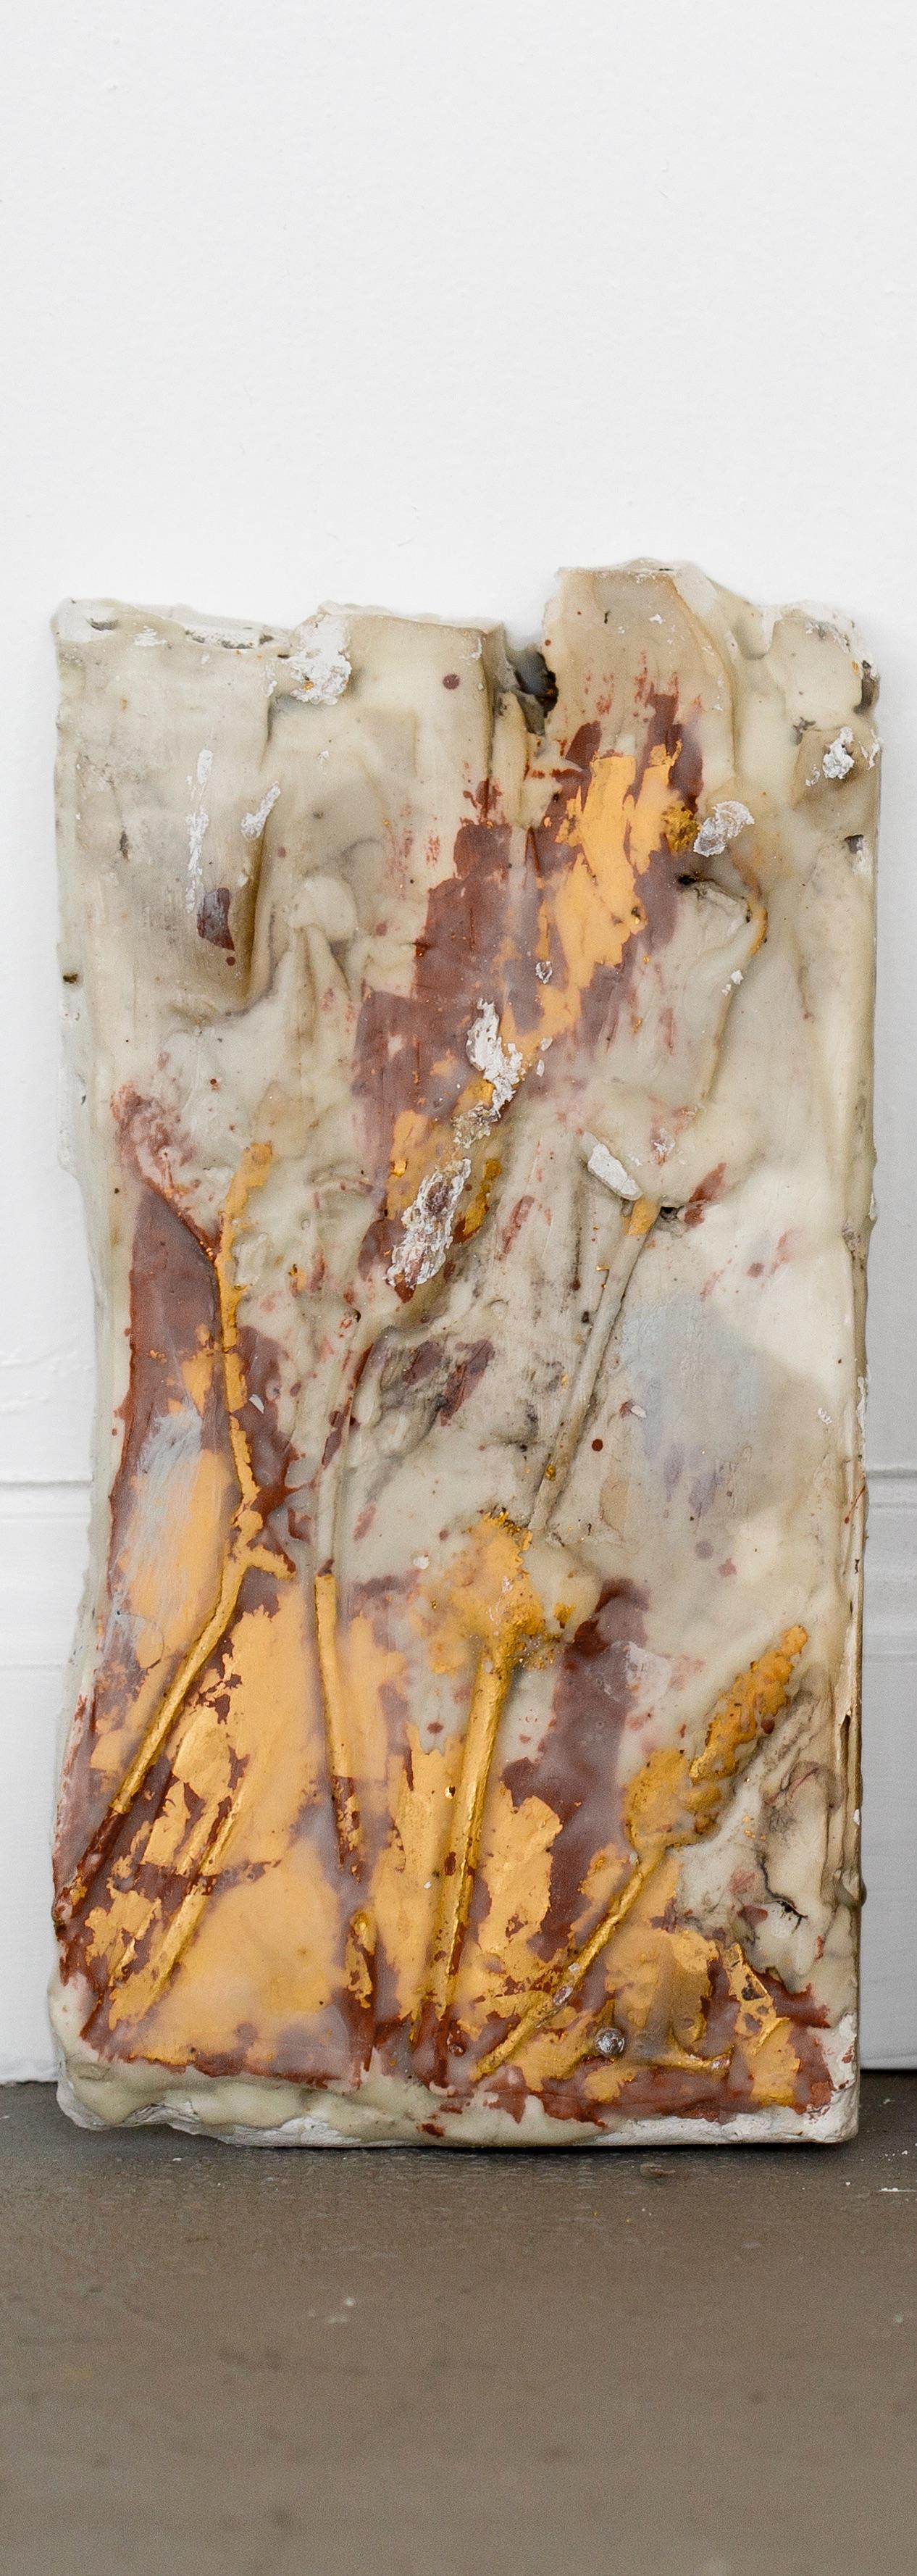 "Walk #1      9"" x 5 1/4"" Plaster, Encaustic Medium, Gold Leaf"